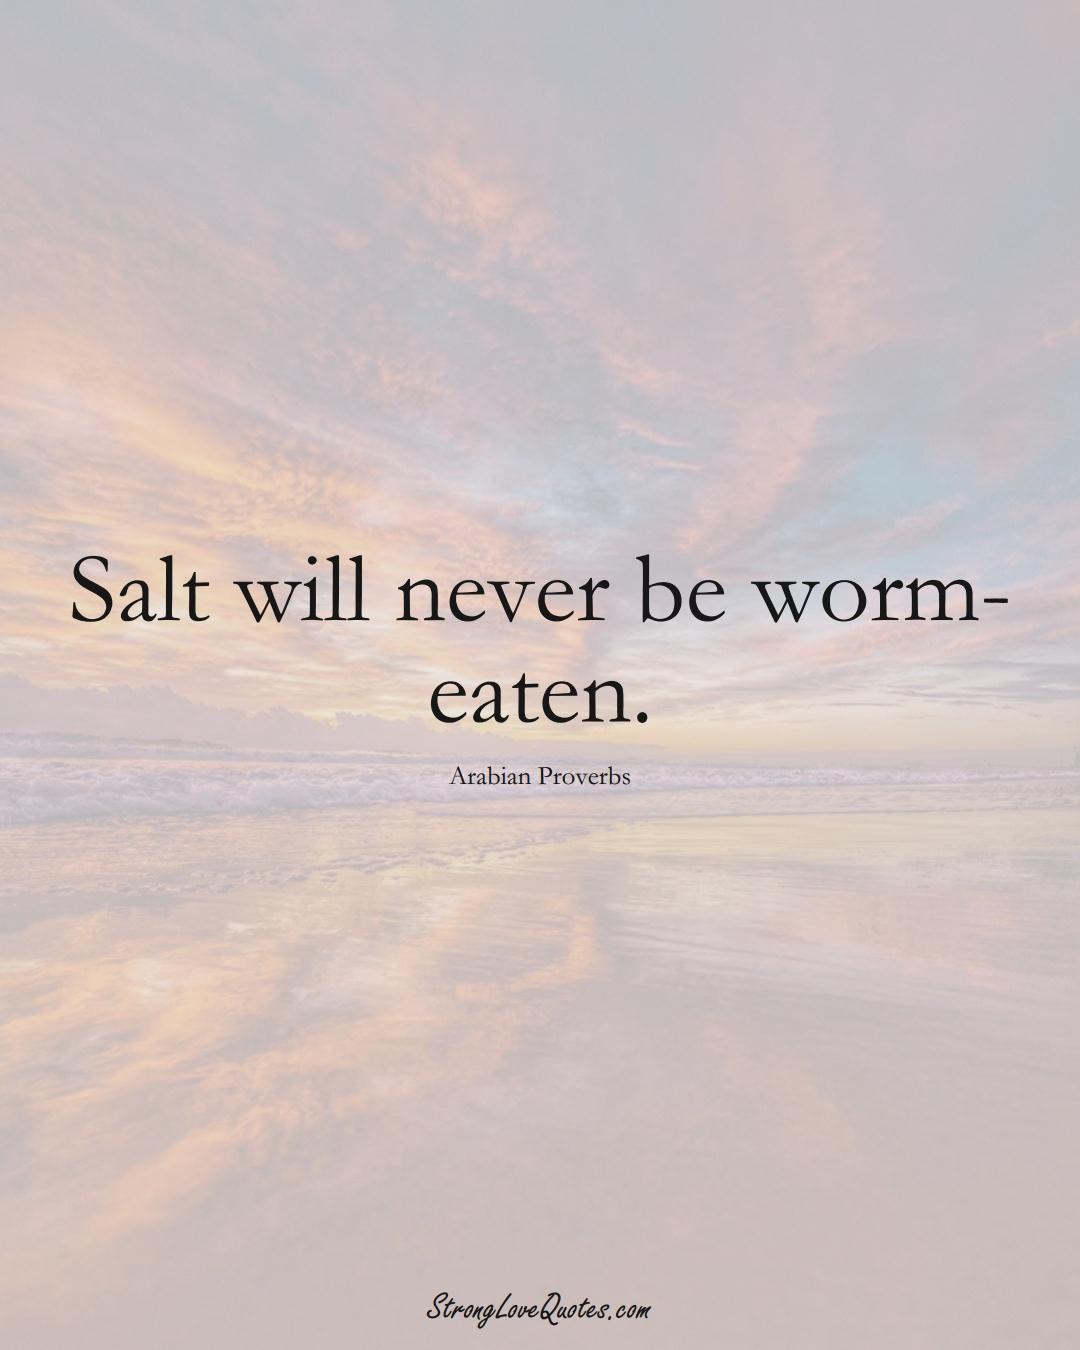 Salt will never be worm-eaten. (Arabian Sayings);  #aVarietyofCulturesSayings